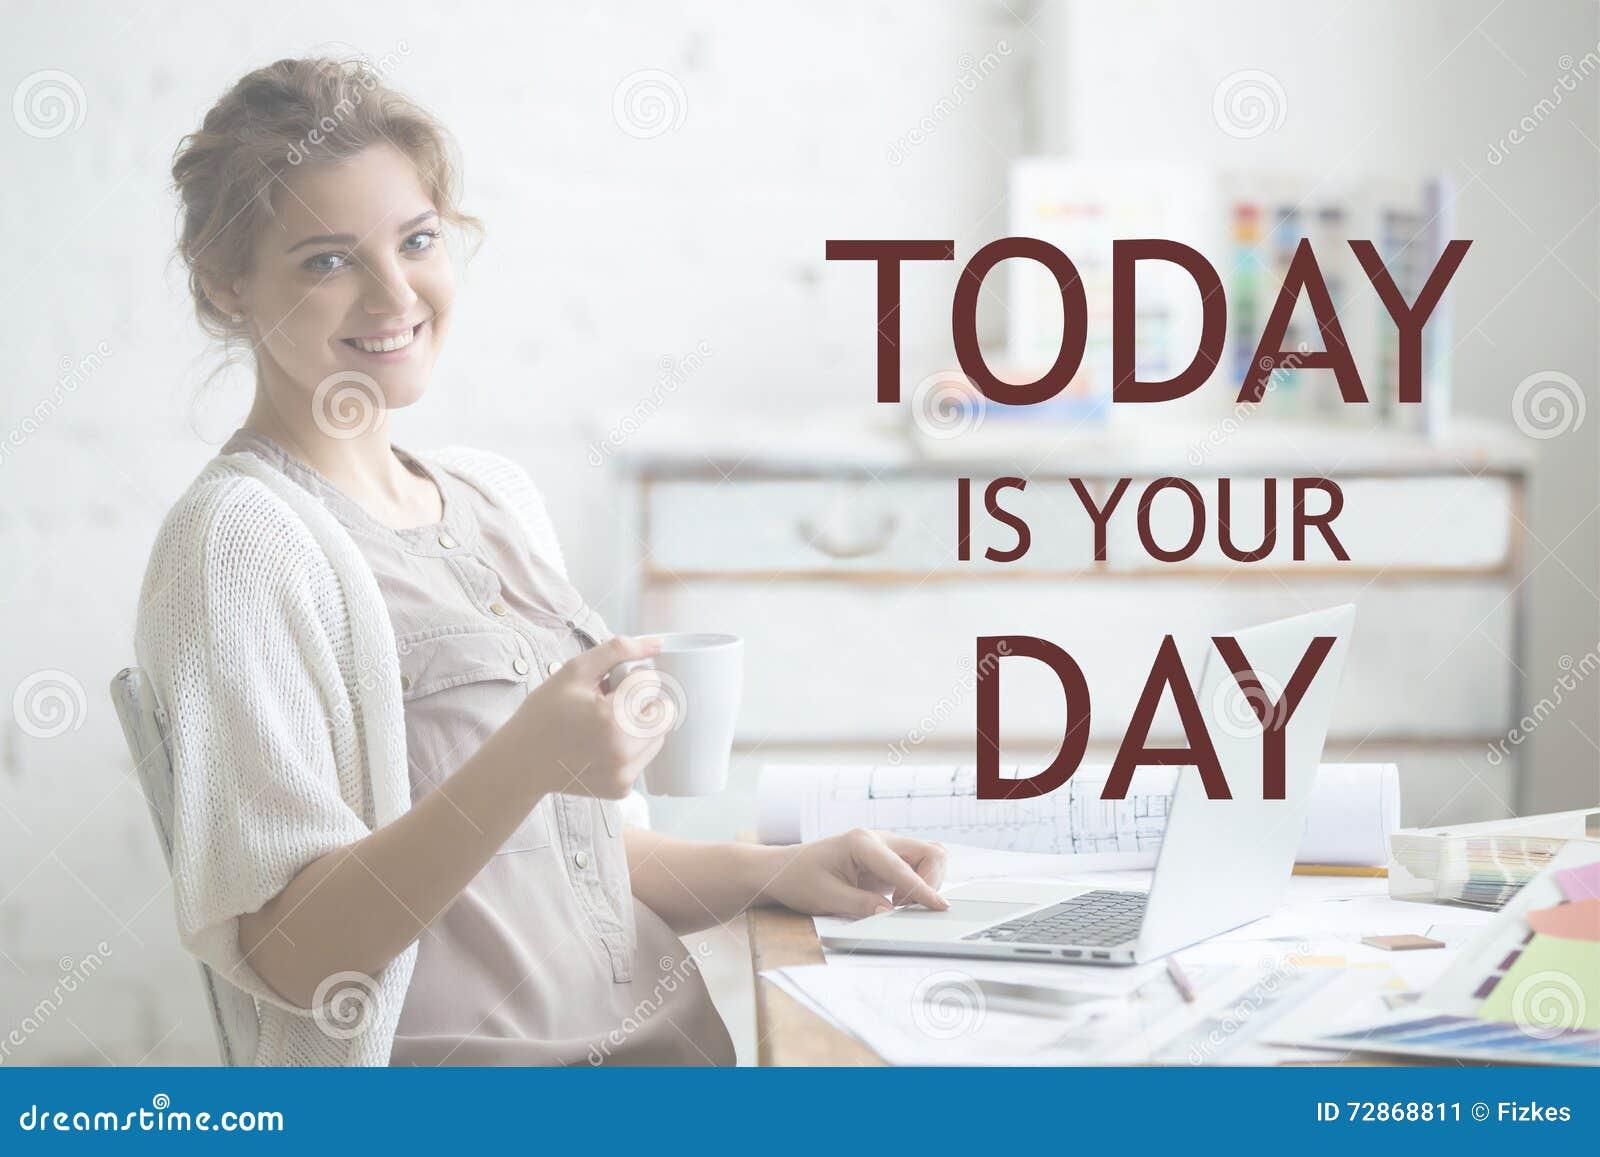 Trabajo con placer Frase de motivación